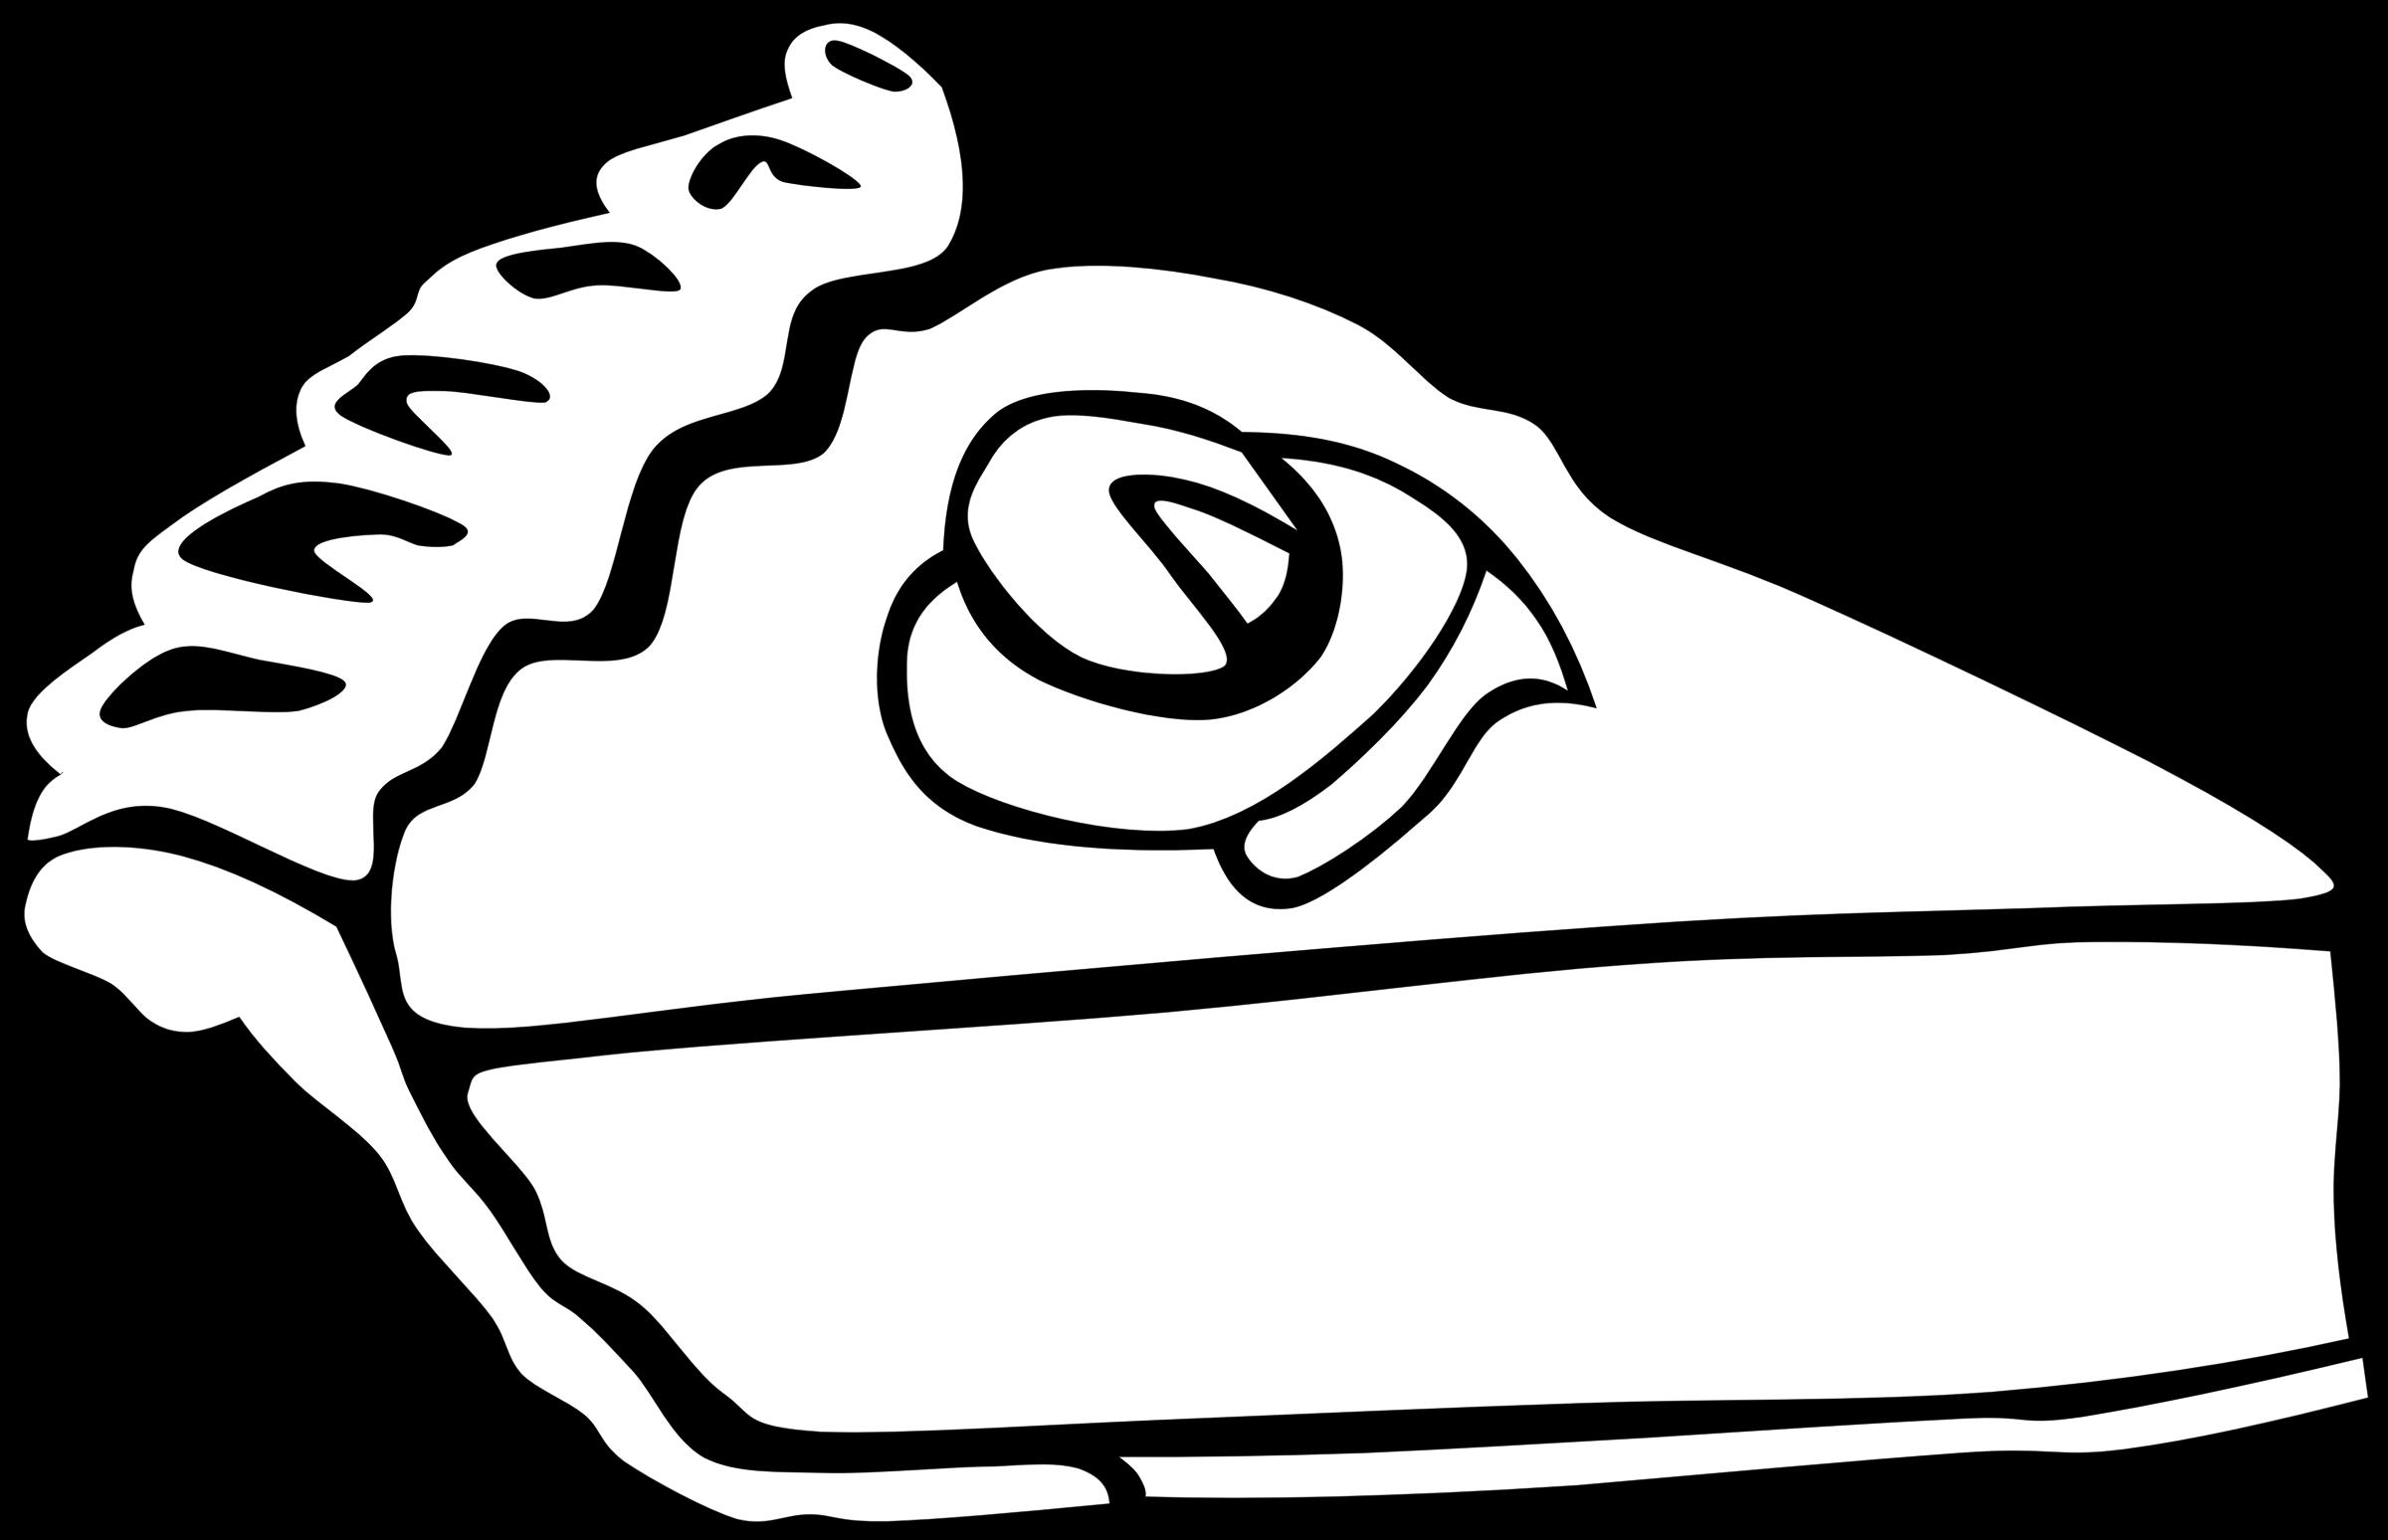 Fast food desserts pies. Pie clipart pie contest